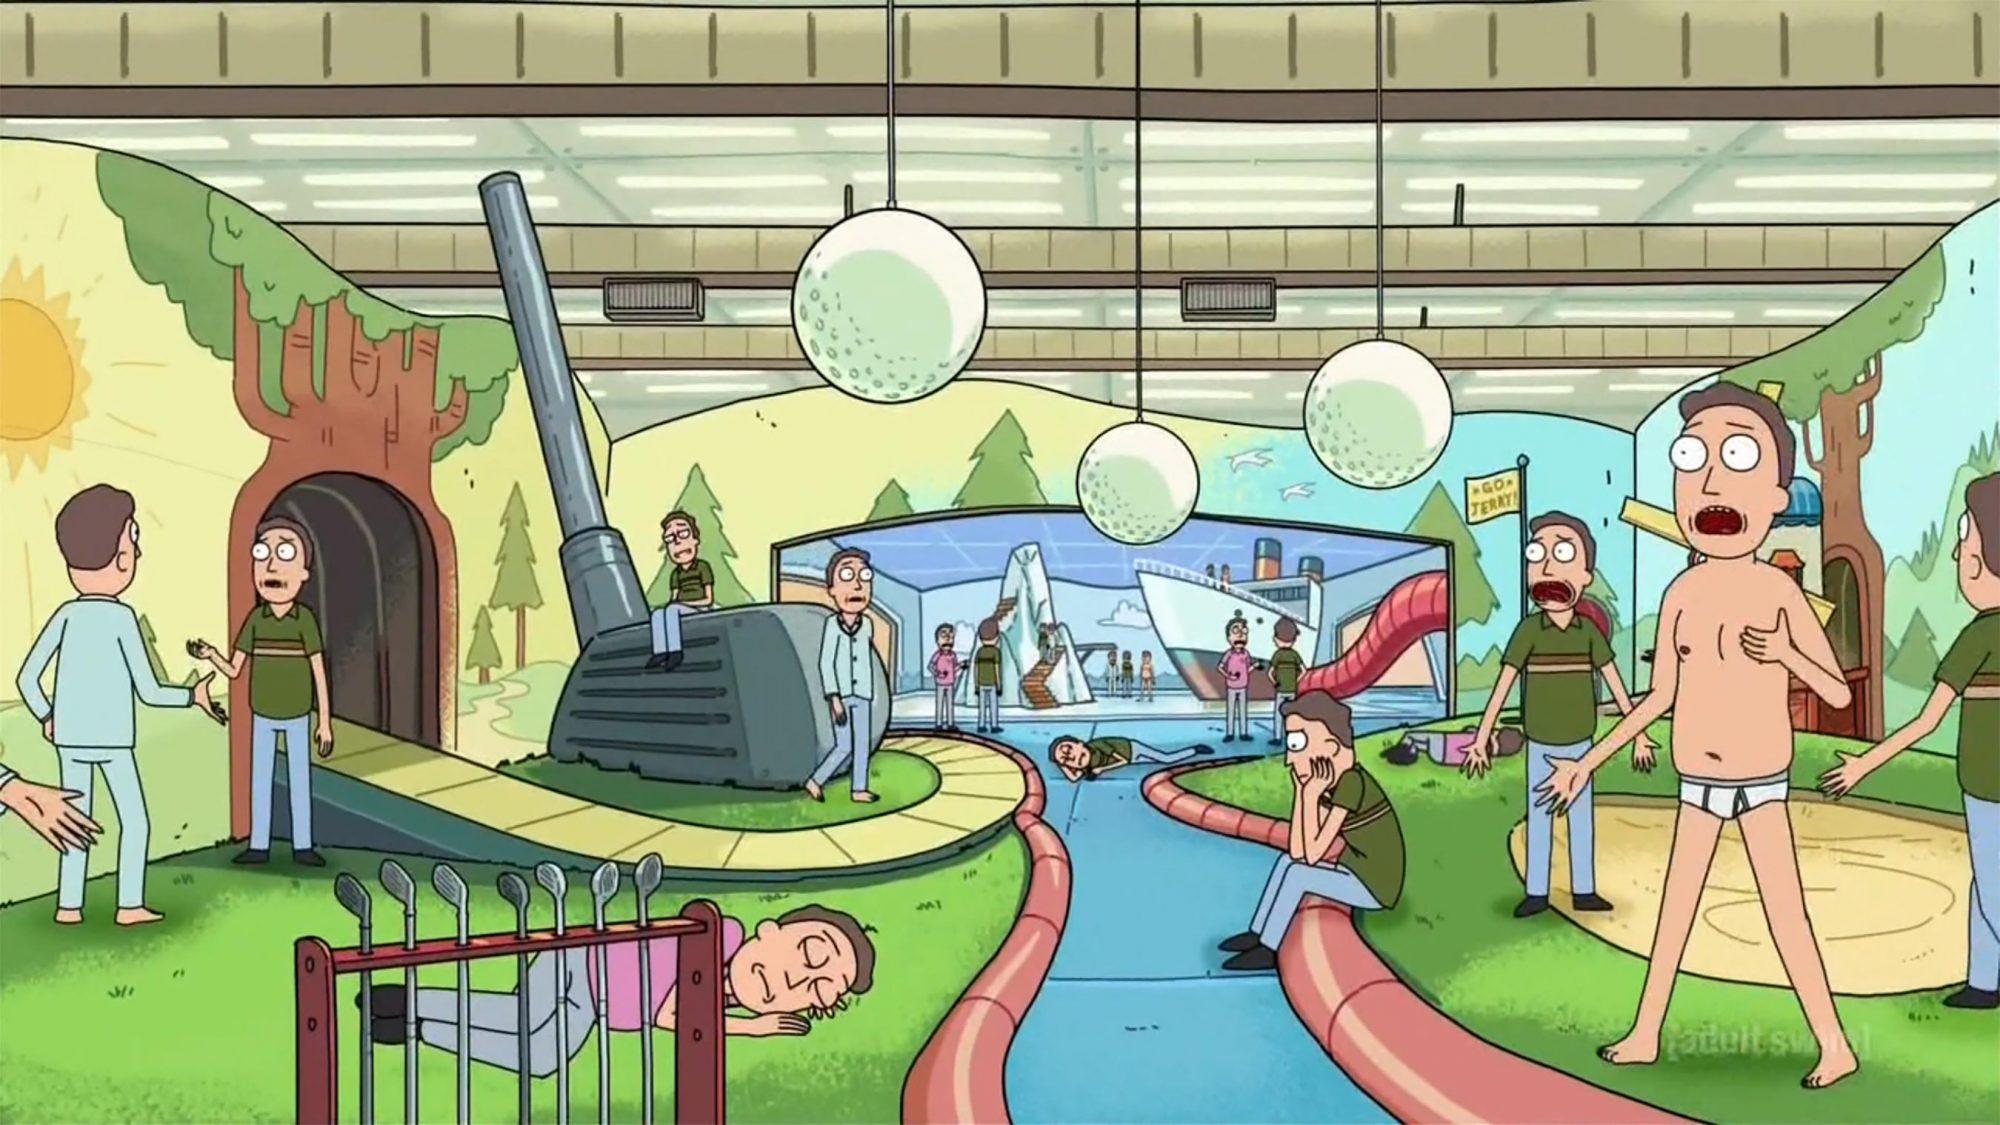 Ricky and Morty - Jerryboree (Season 2, Episode 2)